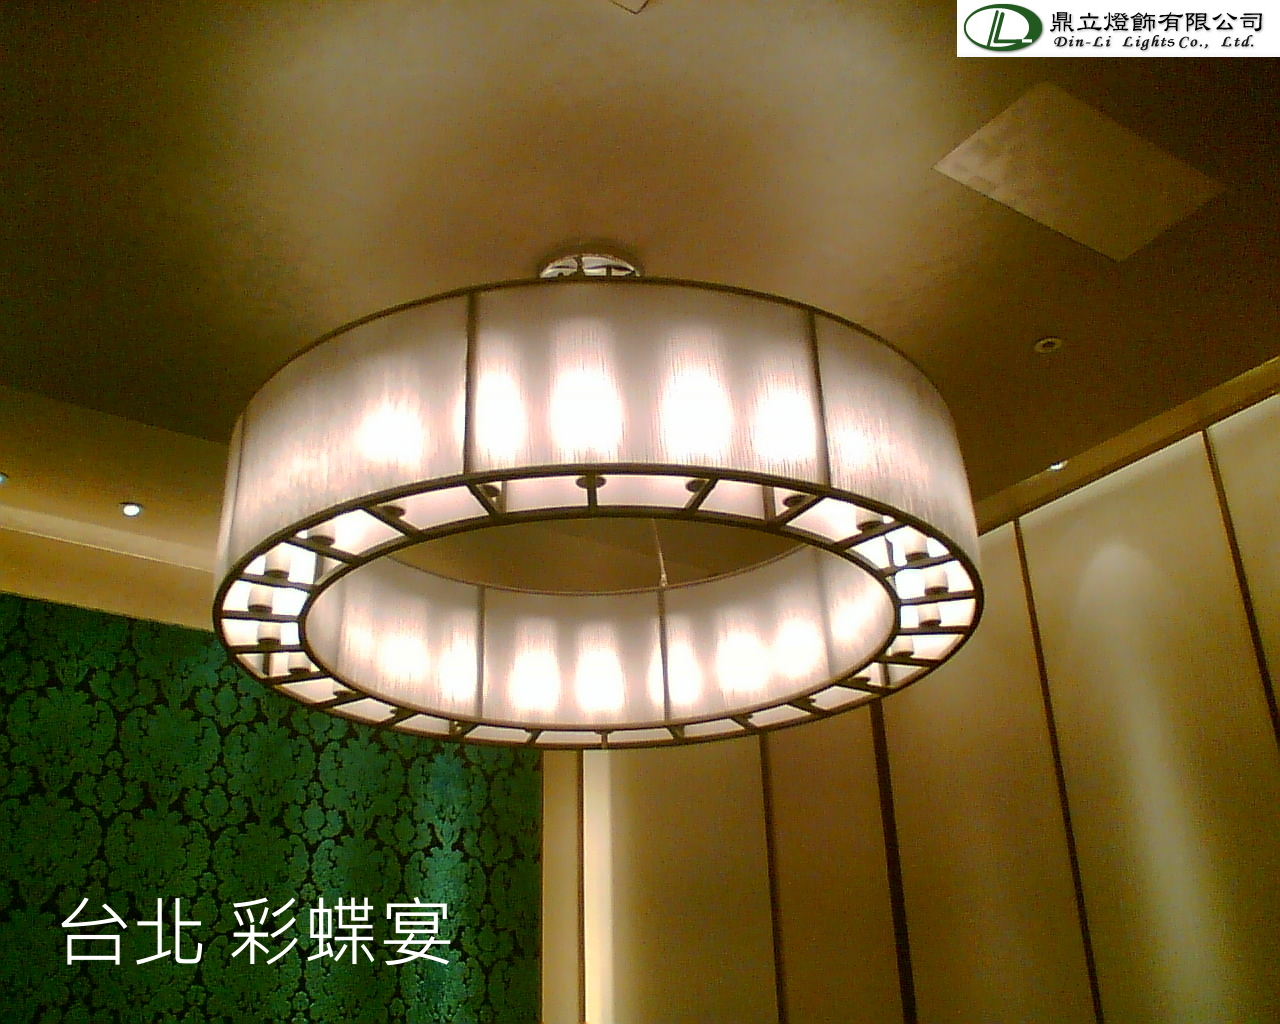 Dinli Lighting 鼎立燈飾有限公司 - 專業訂製燈具: 訂製室內餐廳燈具@彩蝶宴